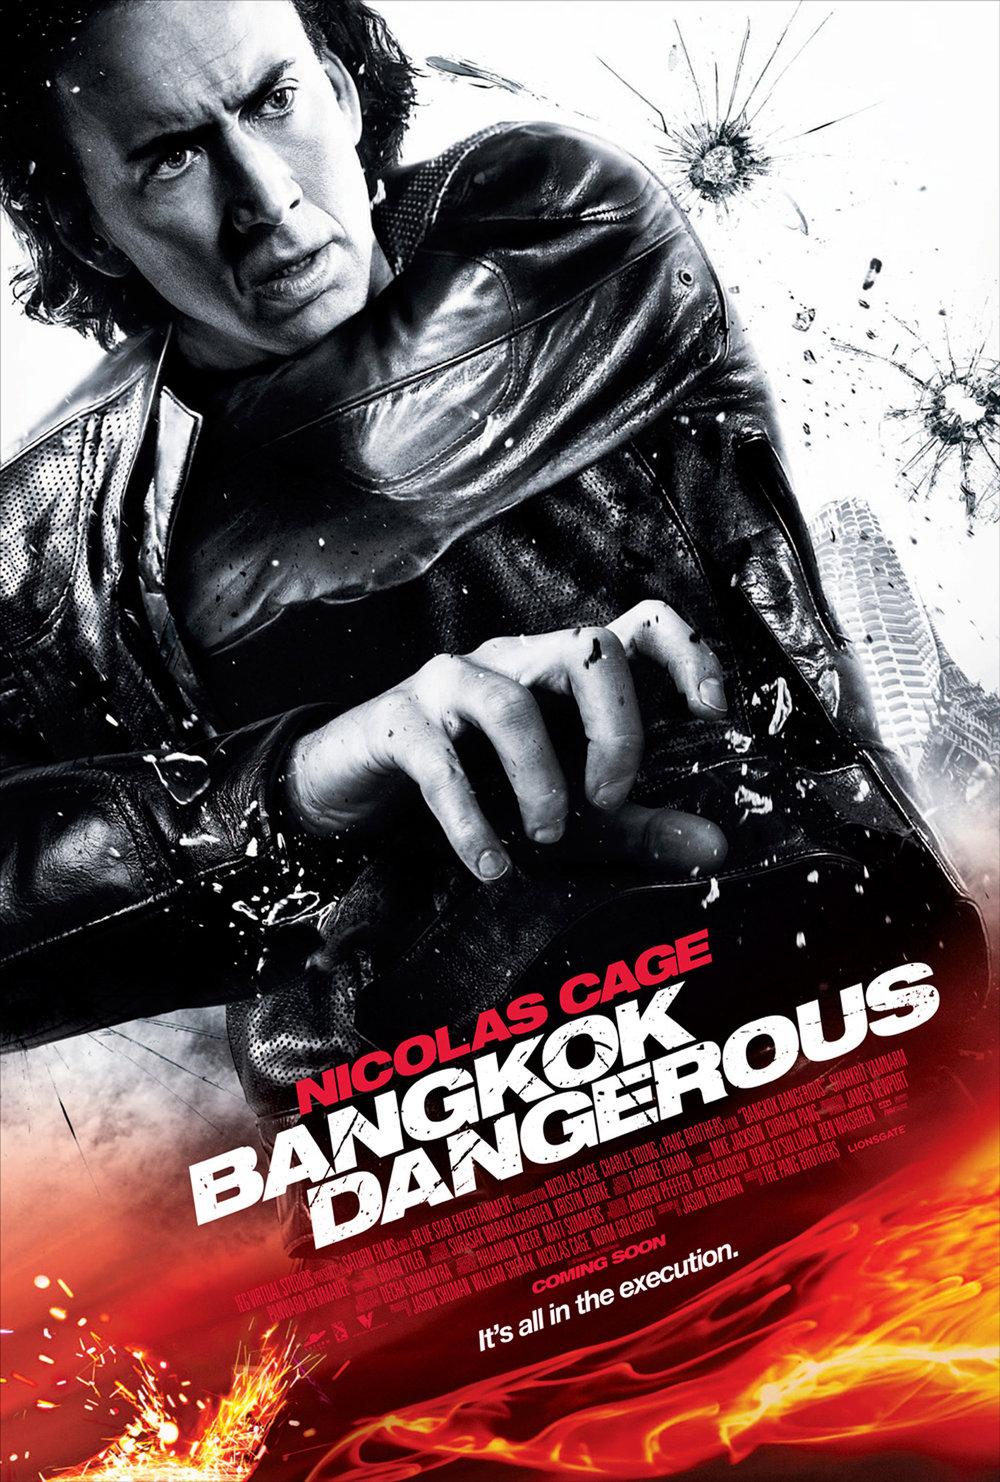 BANGKOK DANGEROUS - Matchmove Artist @ Curv Studios